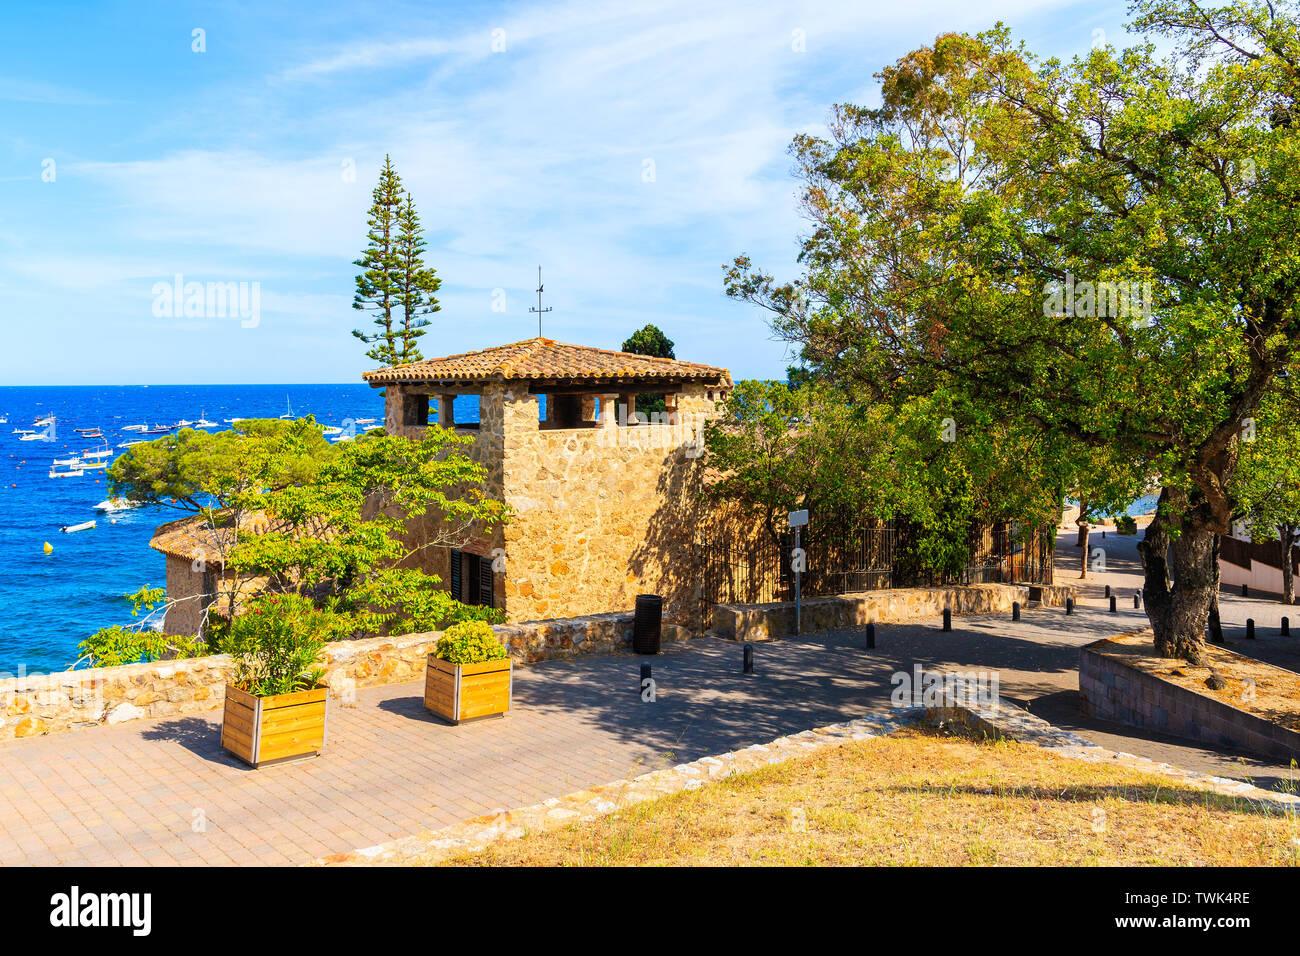 Coastal promenade in Calella de Palafrugell, scenic fishing village with small castle and sandy beach with clear blue water, Costa Brava, Catalonia, S Stock Photo